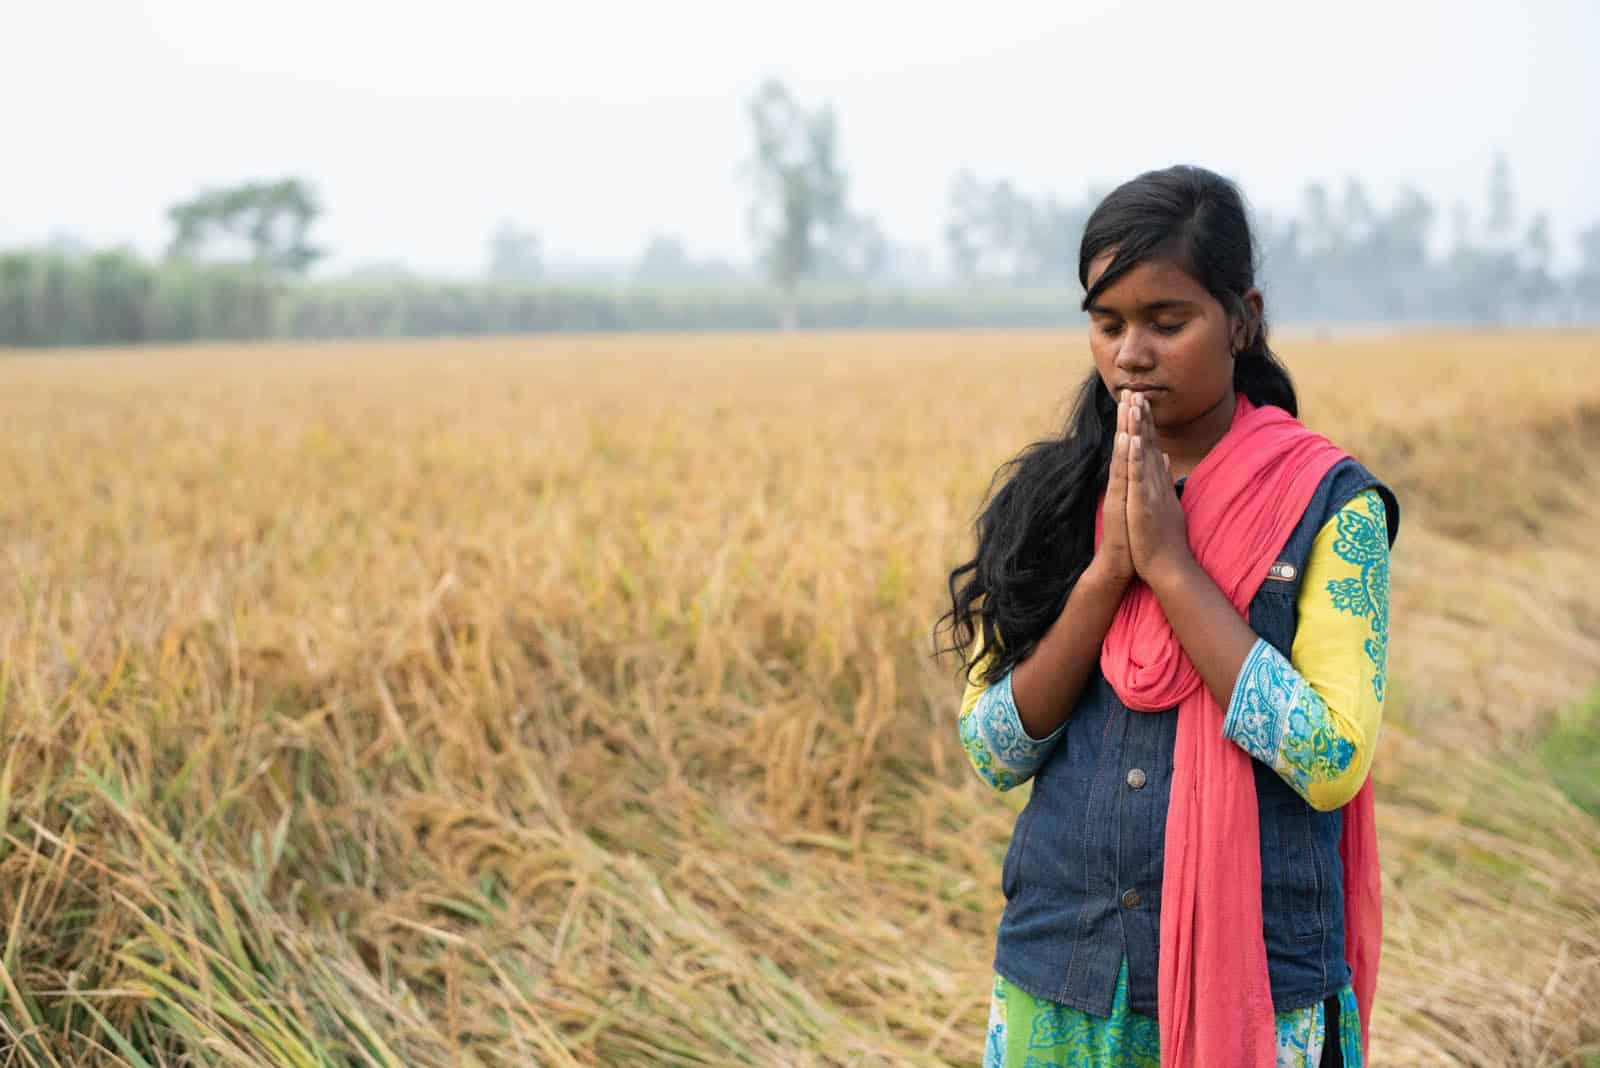 Angela praying in a field